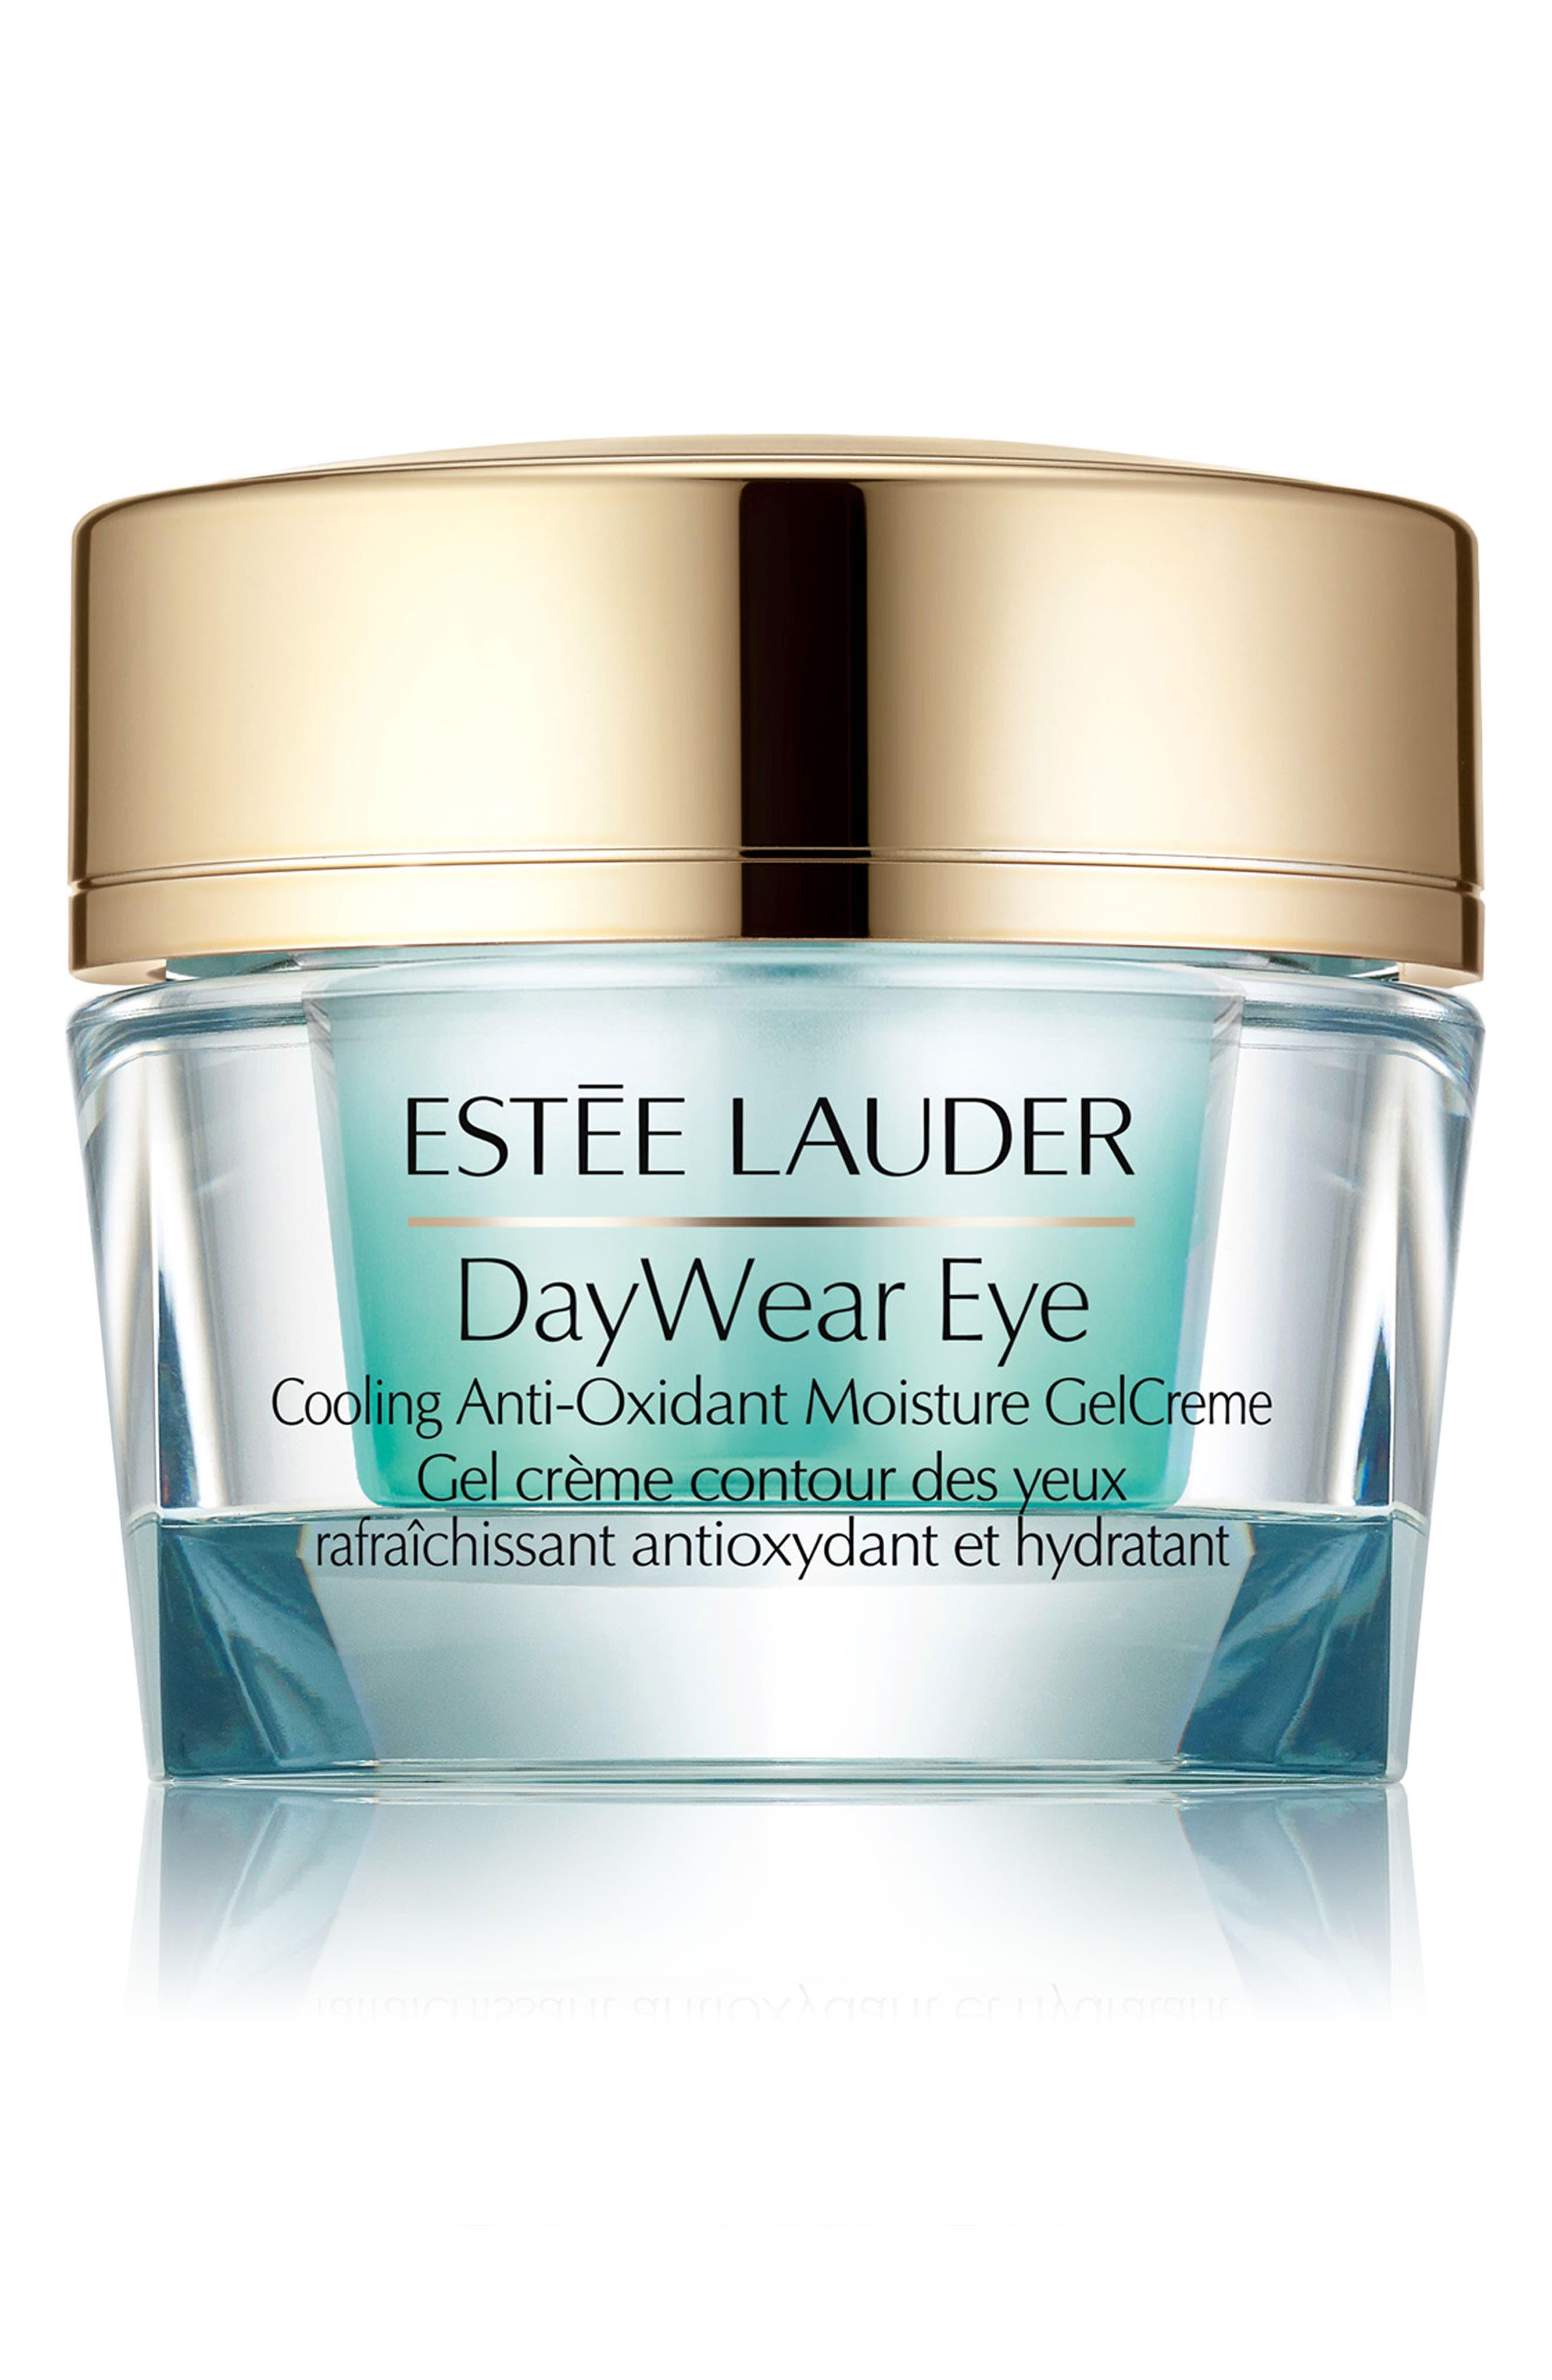 DayWear Eye Cooling Antioxidant Moisture Gel Crème,                             Main thumbnail 1, color,                             NO COLOR